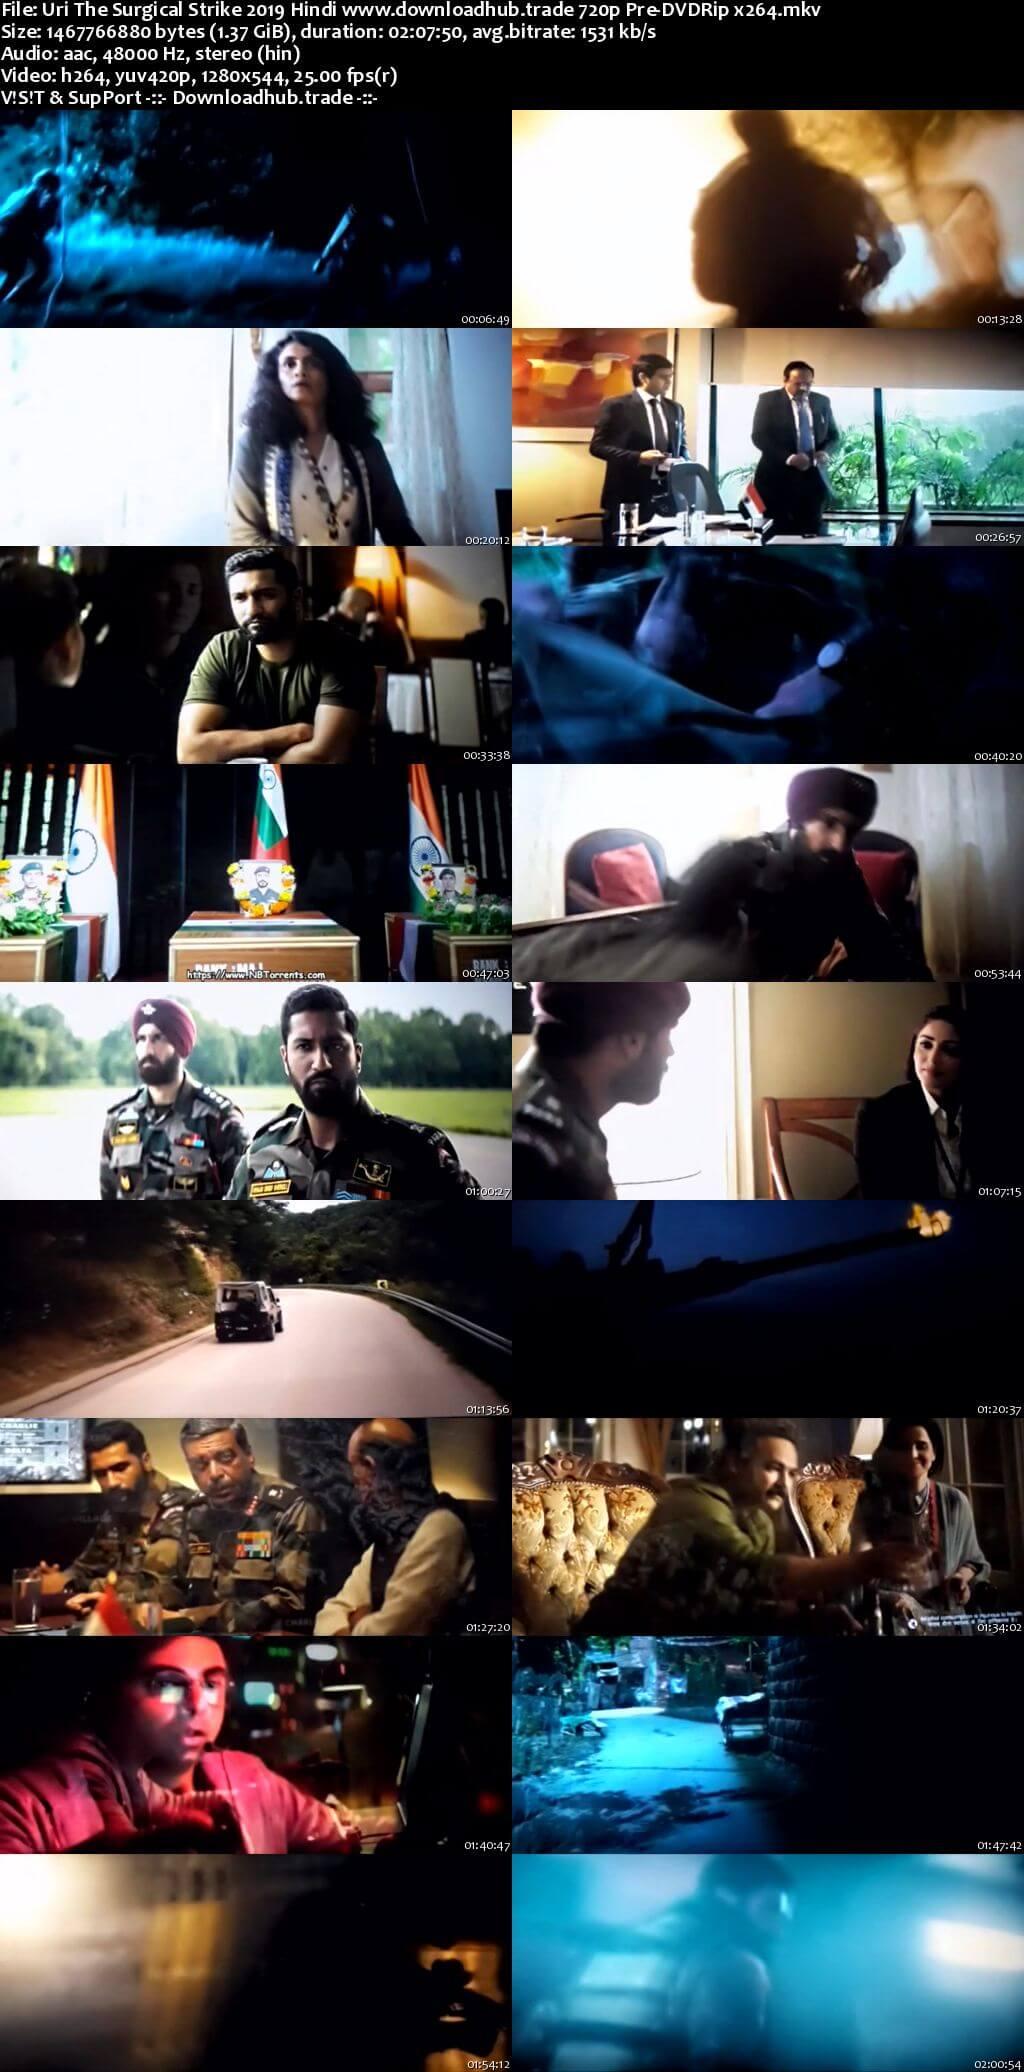 Uri The Surgical Strike 2019 Full Hindi Movie Download 720p Hd Atozhd